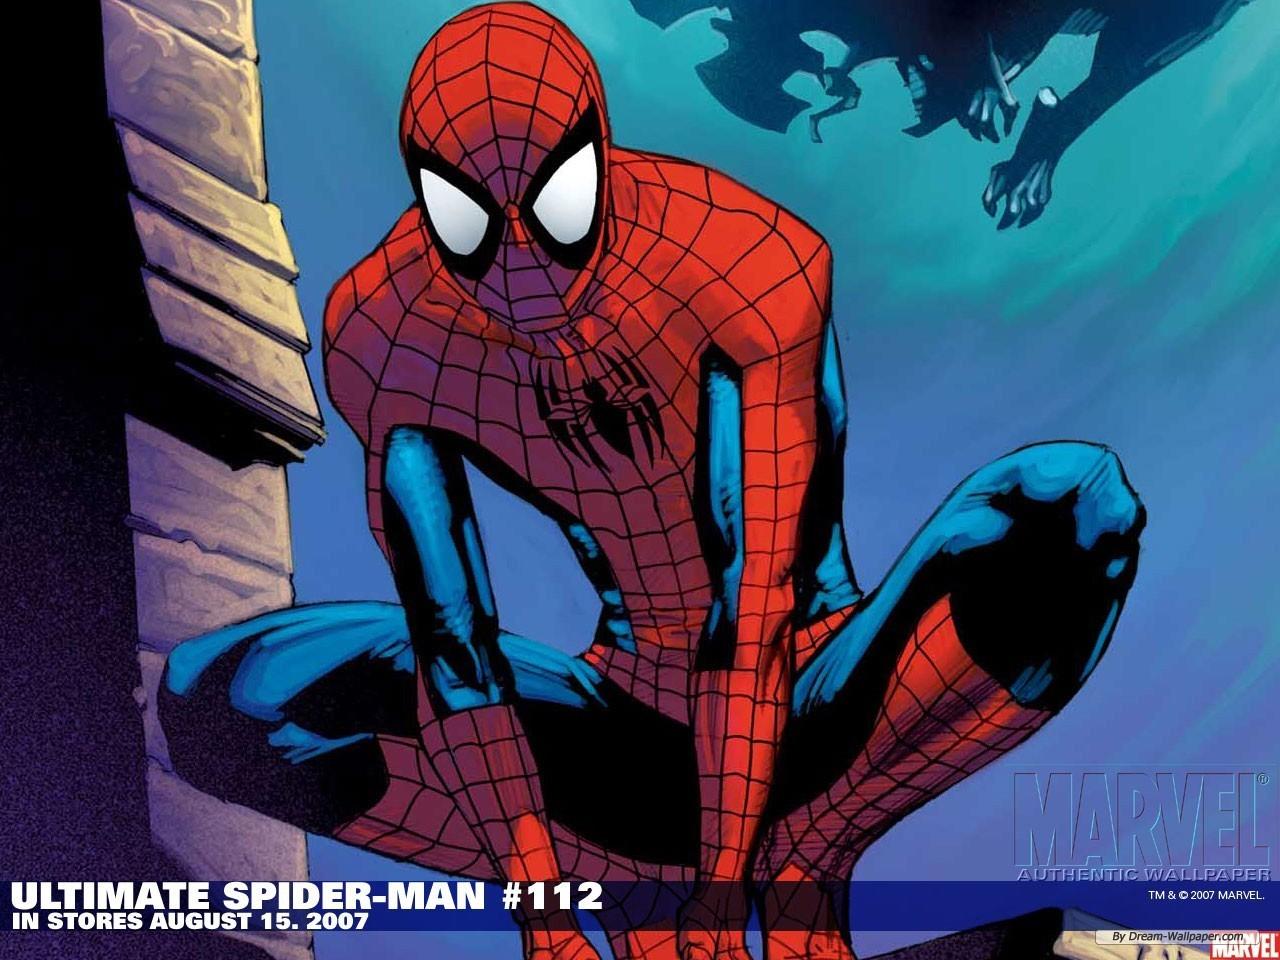 Wallpaper Cartoon wallpaper Spiderman wallpaper 1280x960